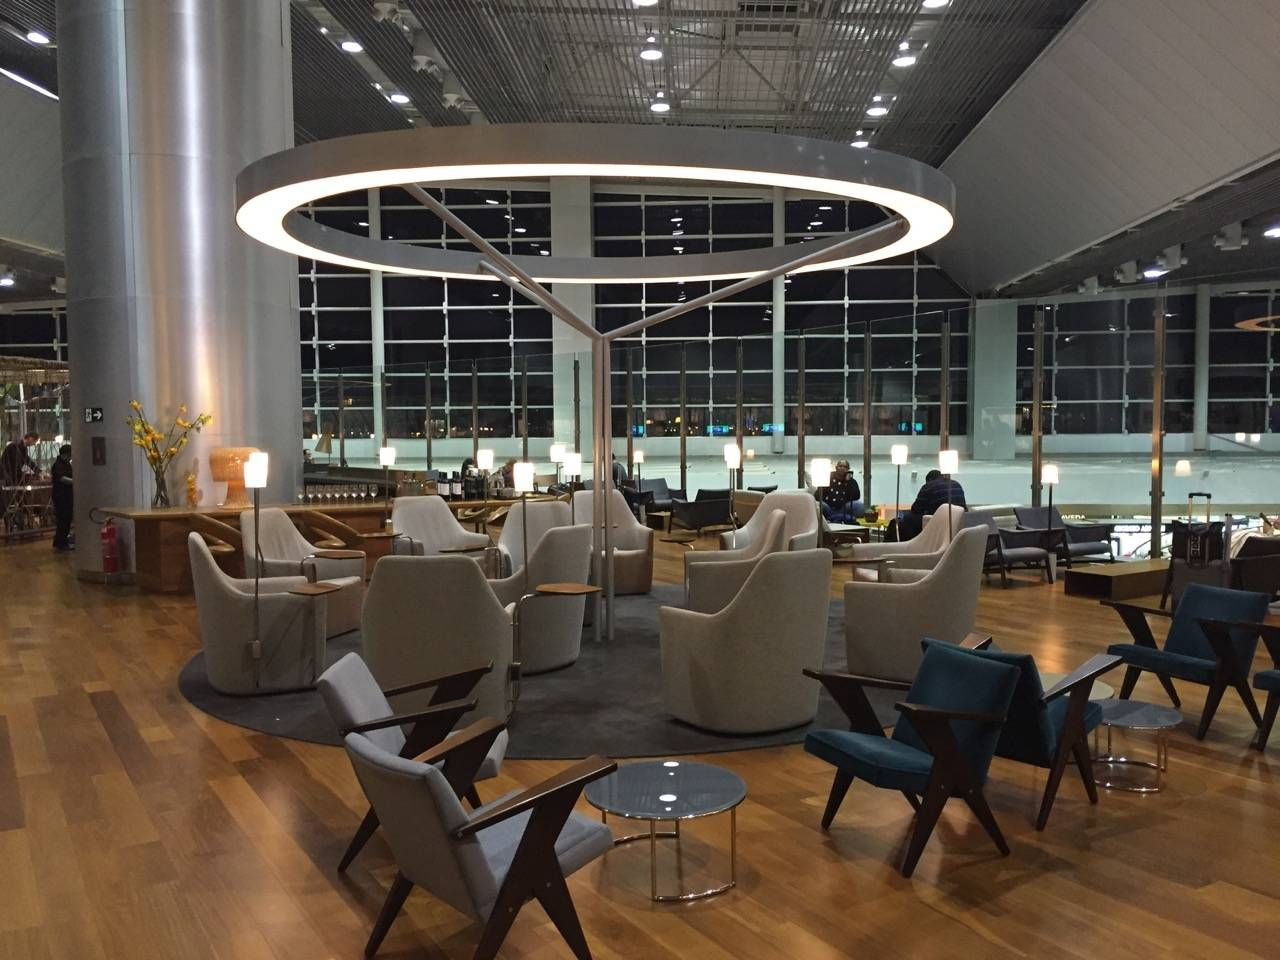 Star Alliance Lounge GRU-022